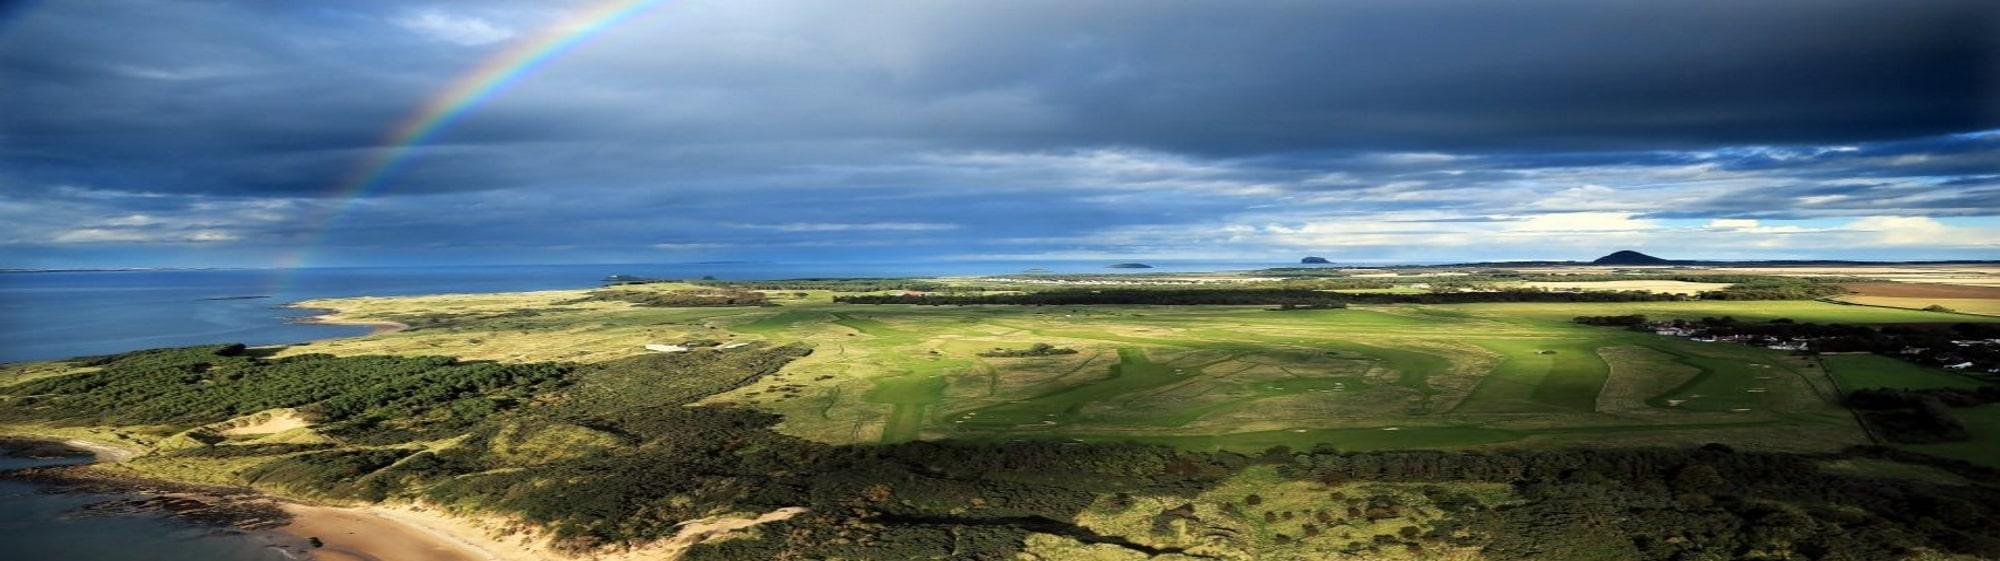 Scotland golf tour muirfield